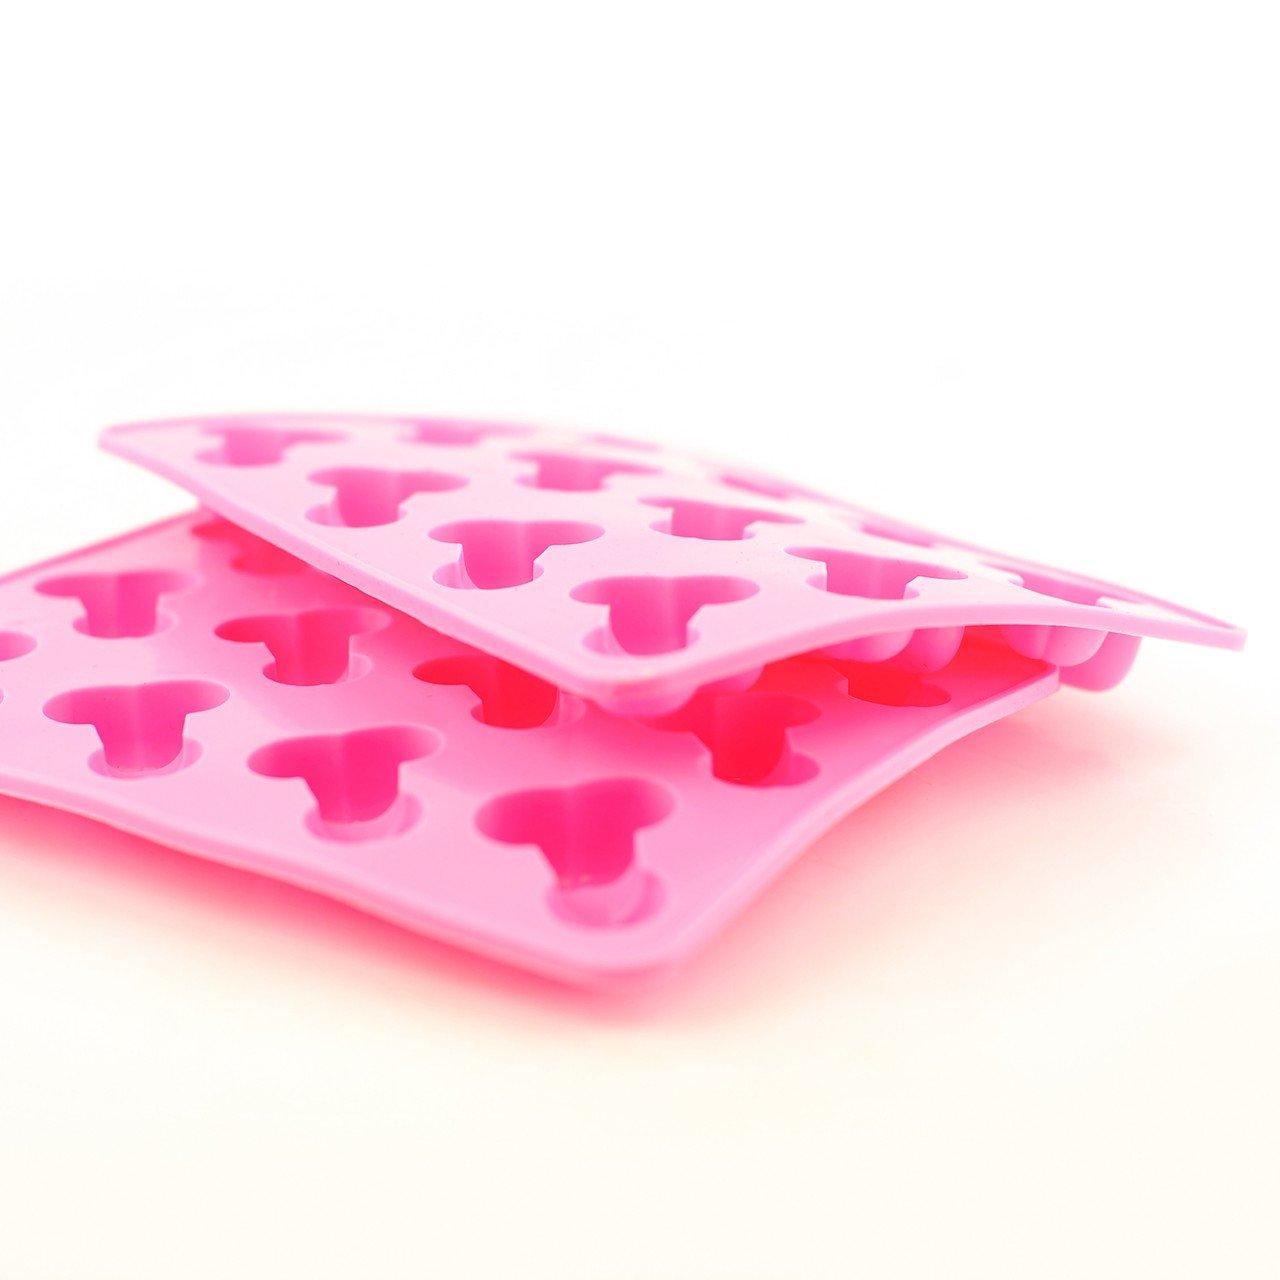 2 x Willy PENE Cubito de hielo bandeja para horno molde para gelatina feliz para despedida de soltera fiesta: Amazon.es: Hogar